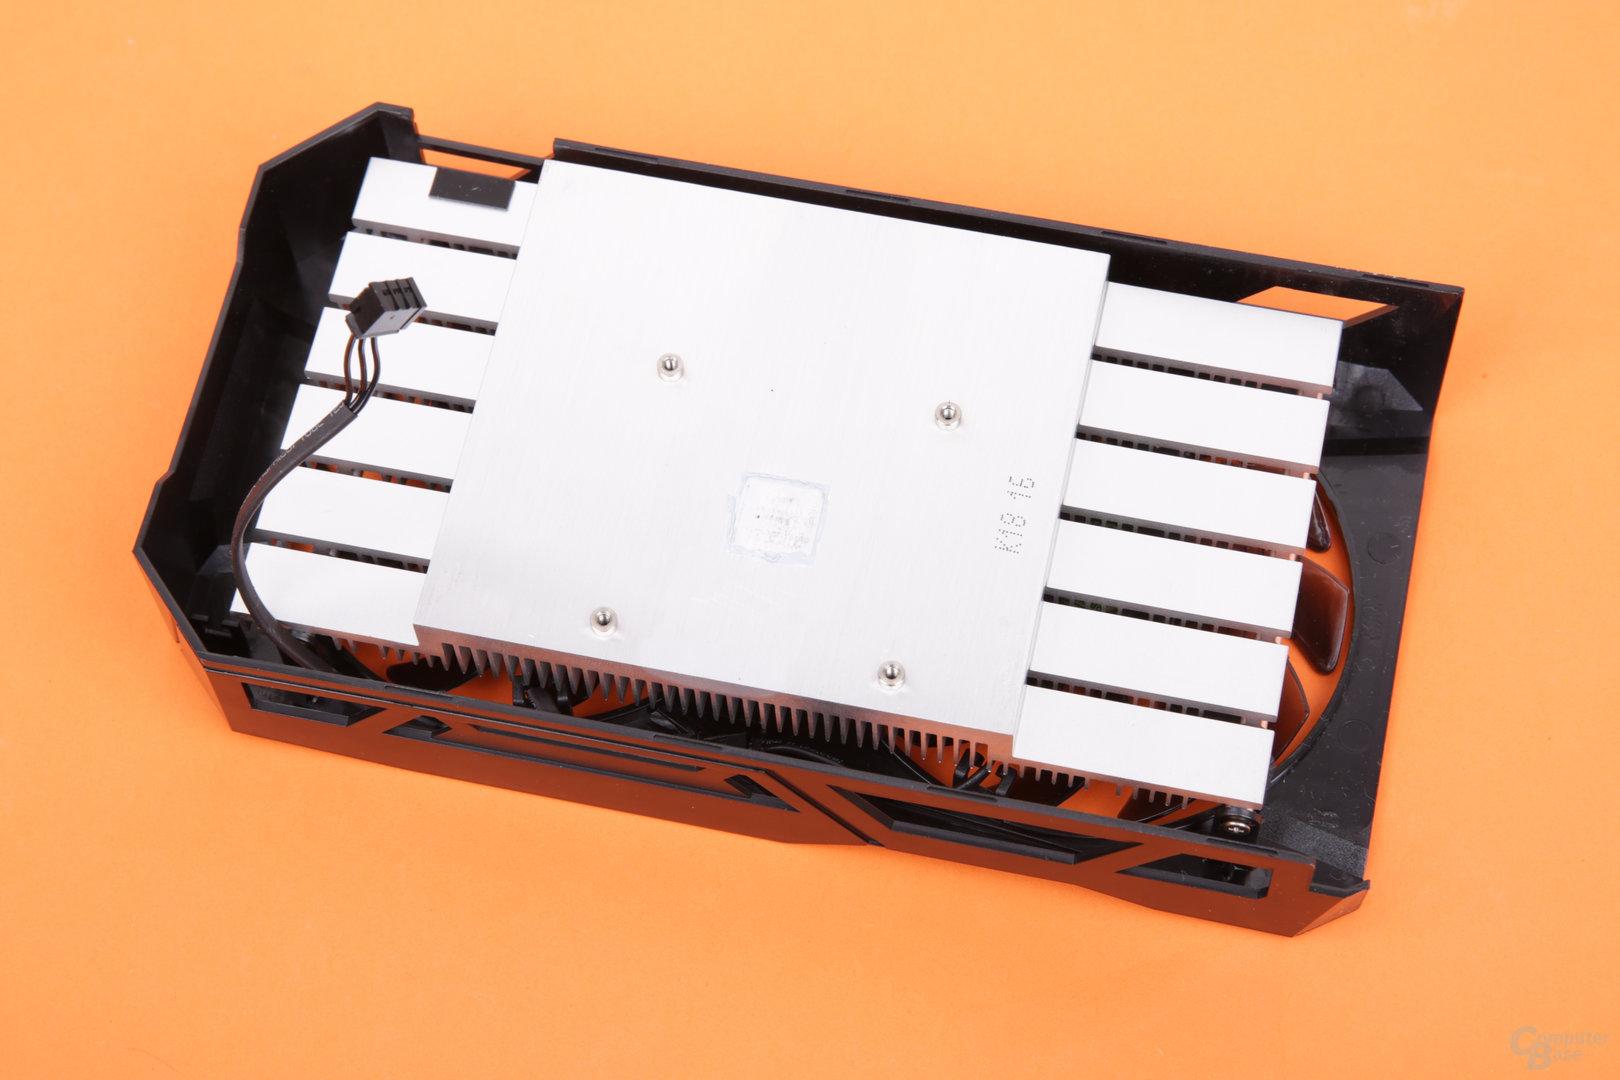 Gigabyte GeForce GTX 1050 3GB Windforce – Kühlerrückseite